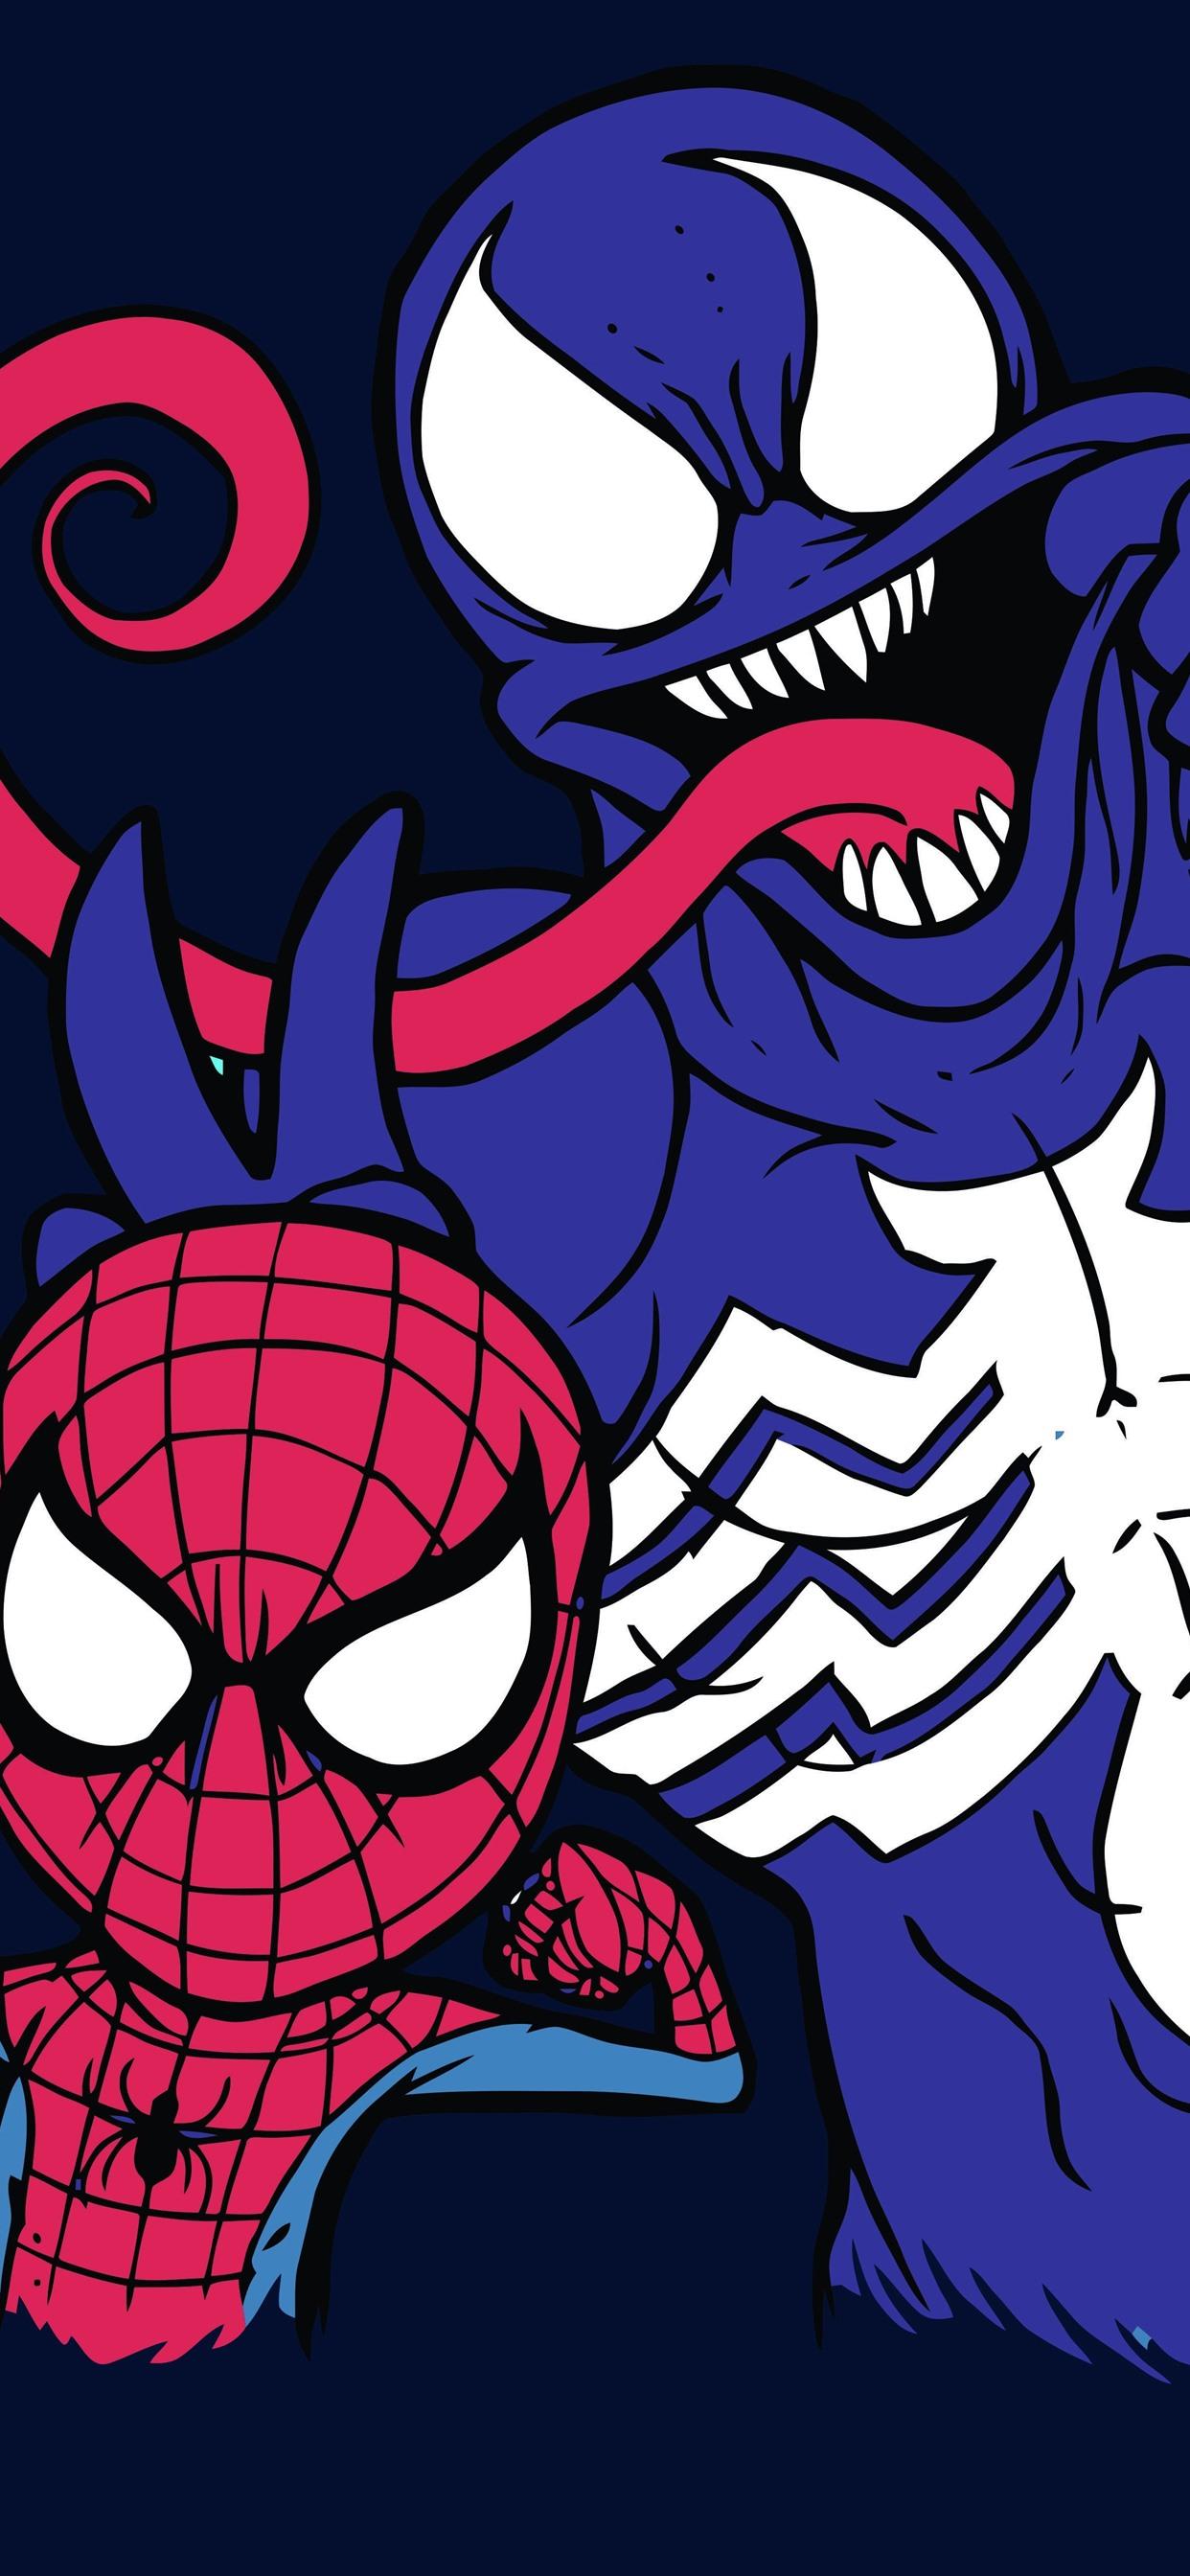 Spider Man And Venom Dc Comics 1242x2688 Iphone Xs Max